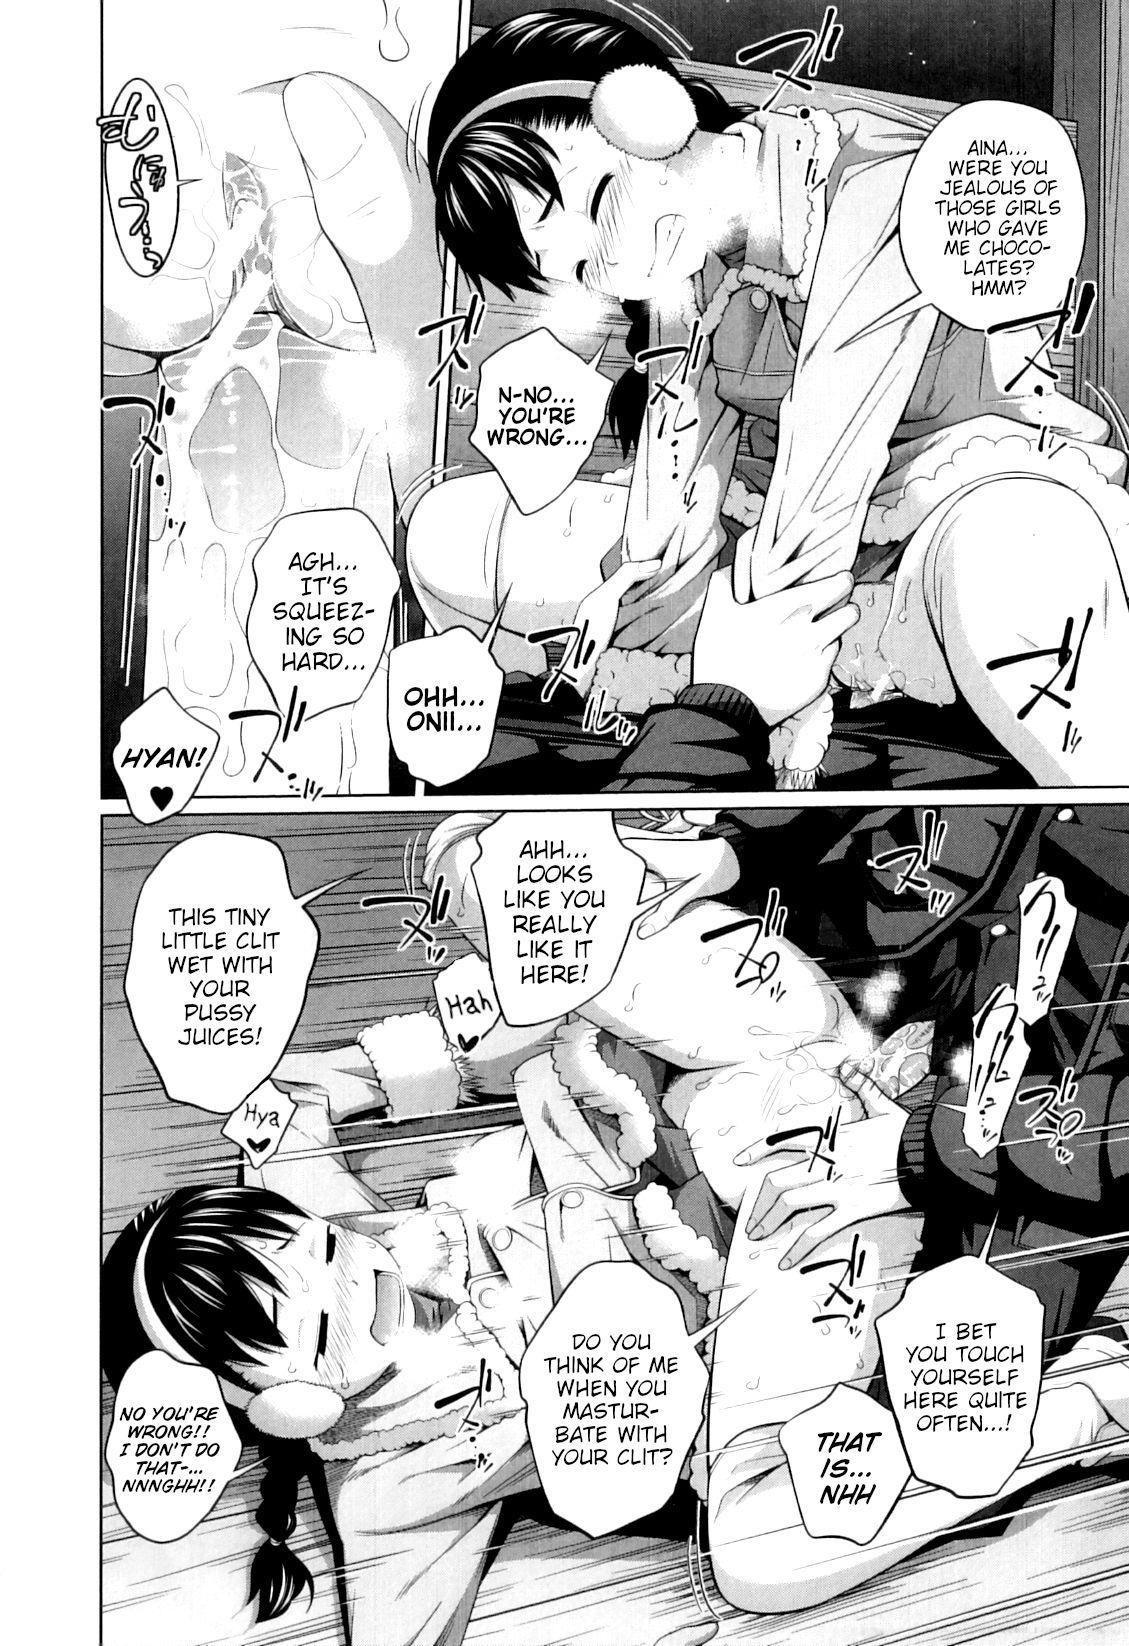 [Tsubaki Jushirou] Onii-chan no Kuse ni Namaiki nanda mon! | Onii-chan is such a bully! (My Mai Secret) [English] [Mondee + Brook09] 19